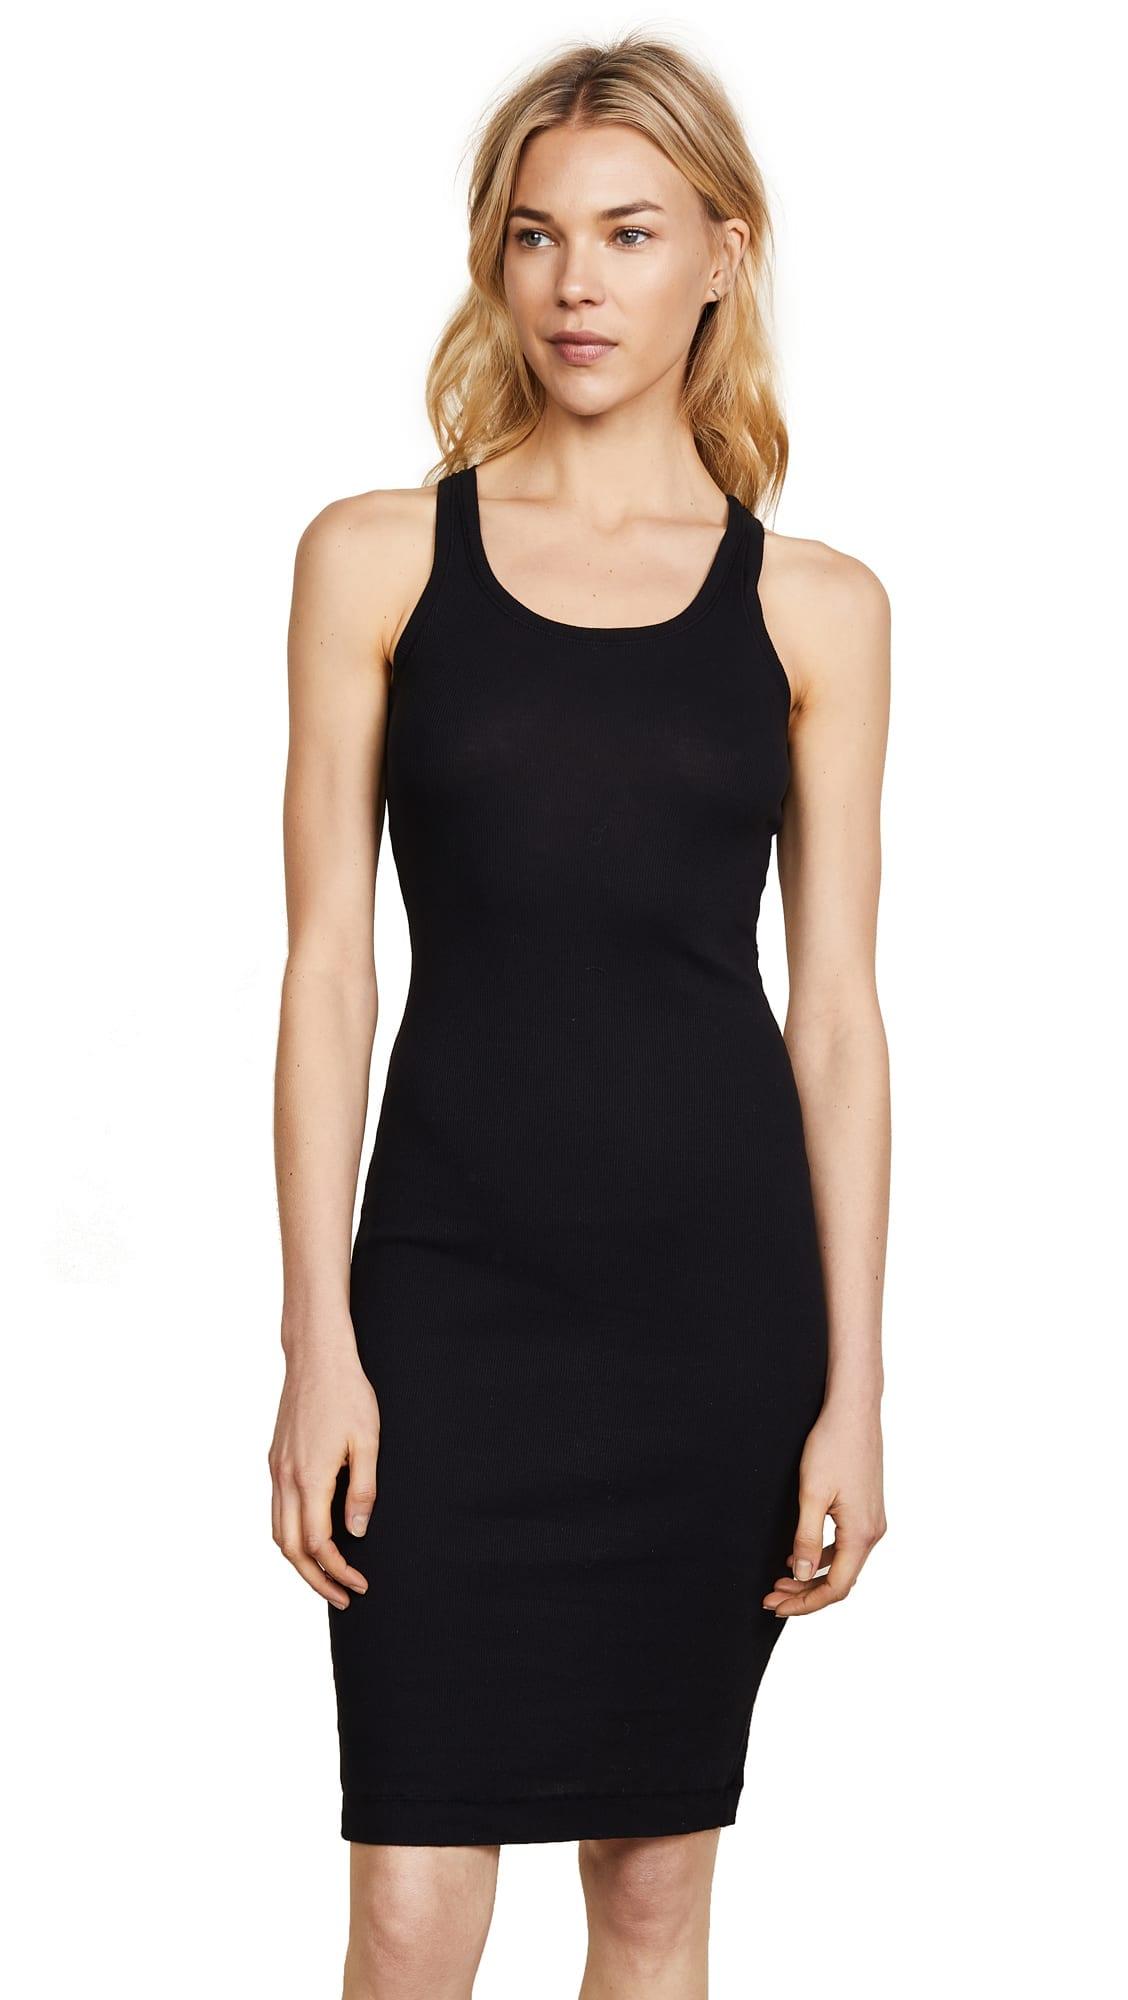 shopbop Splendid 2x1 Racer Back Dress